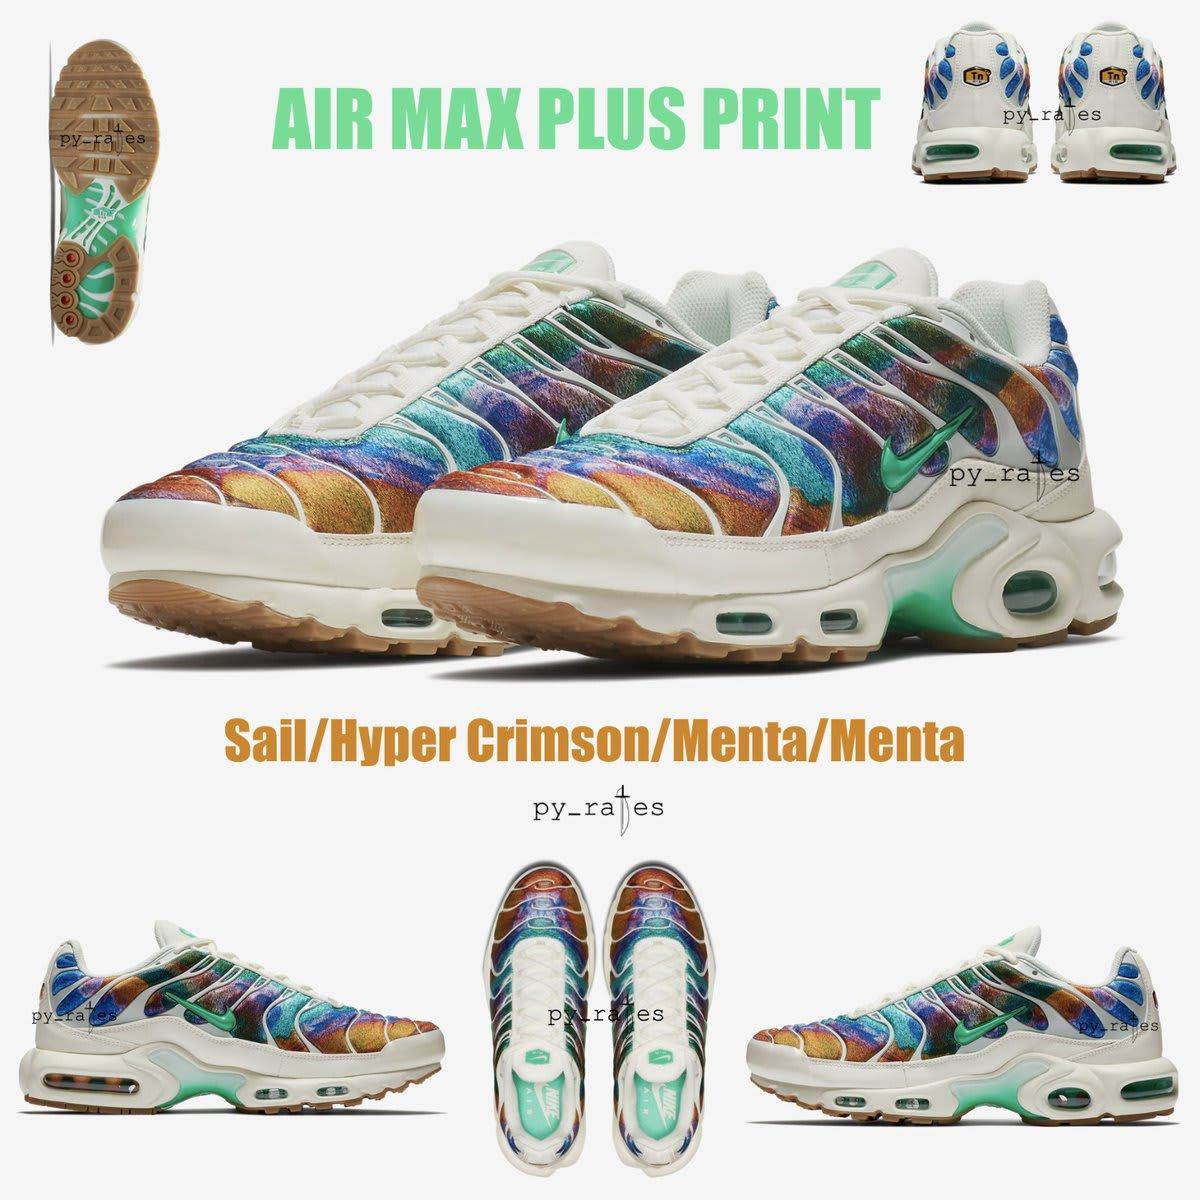 Nike Air Max Plus Print 'Sail/Hyper Crimson/Menta/Menta'